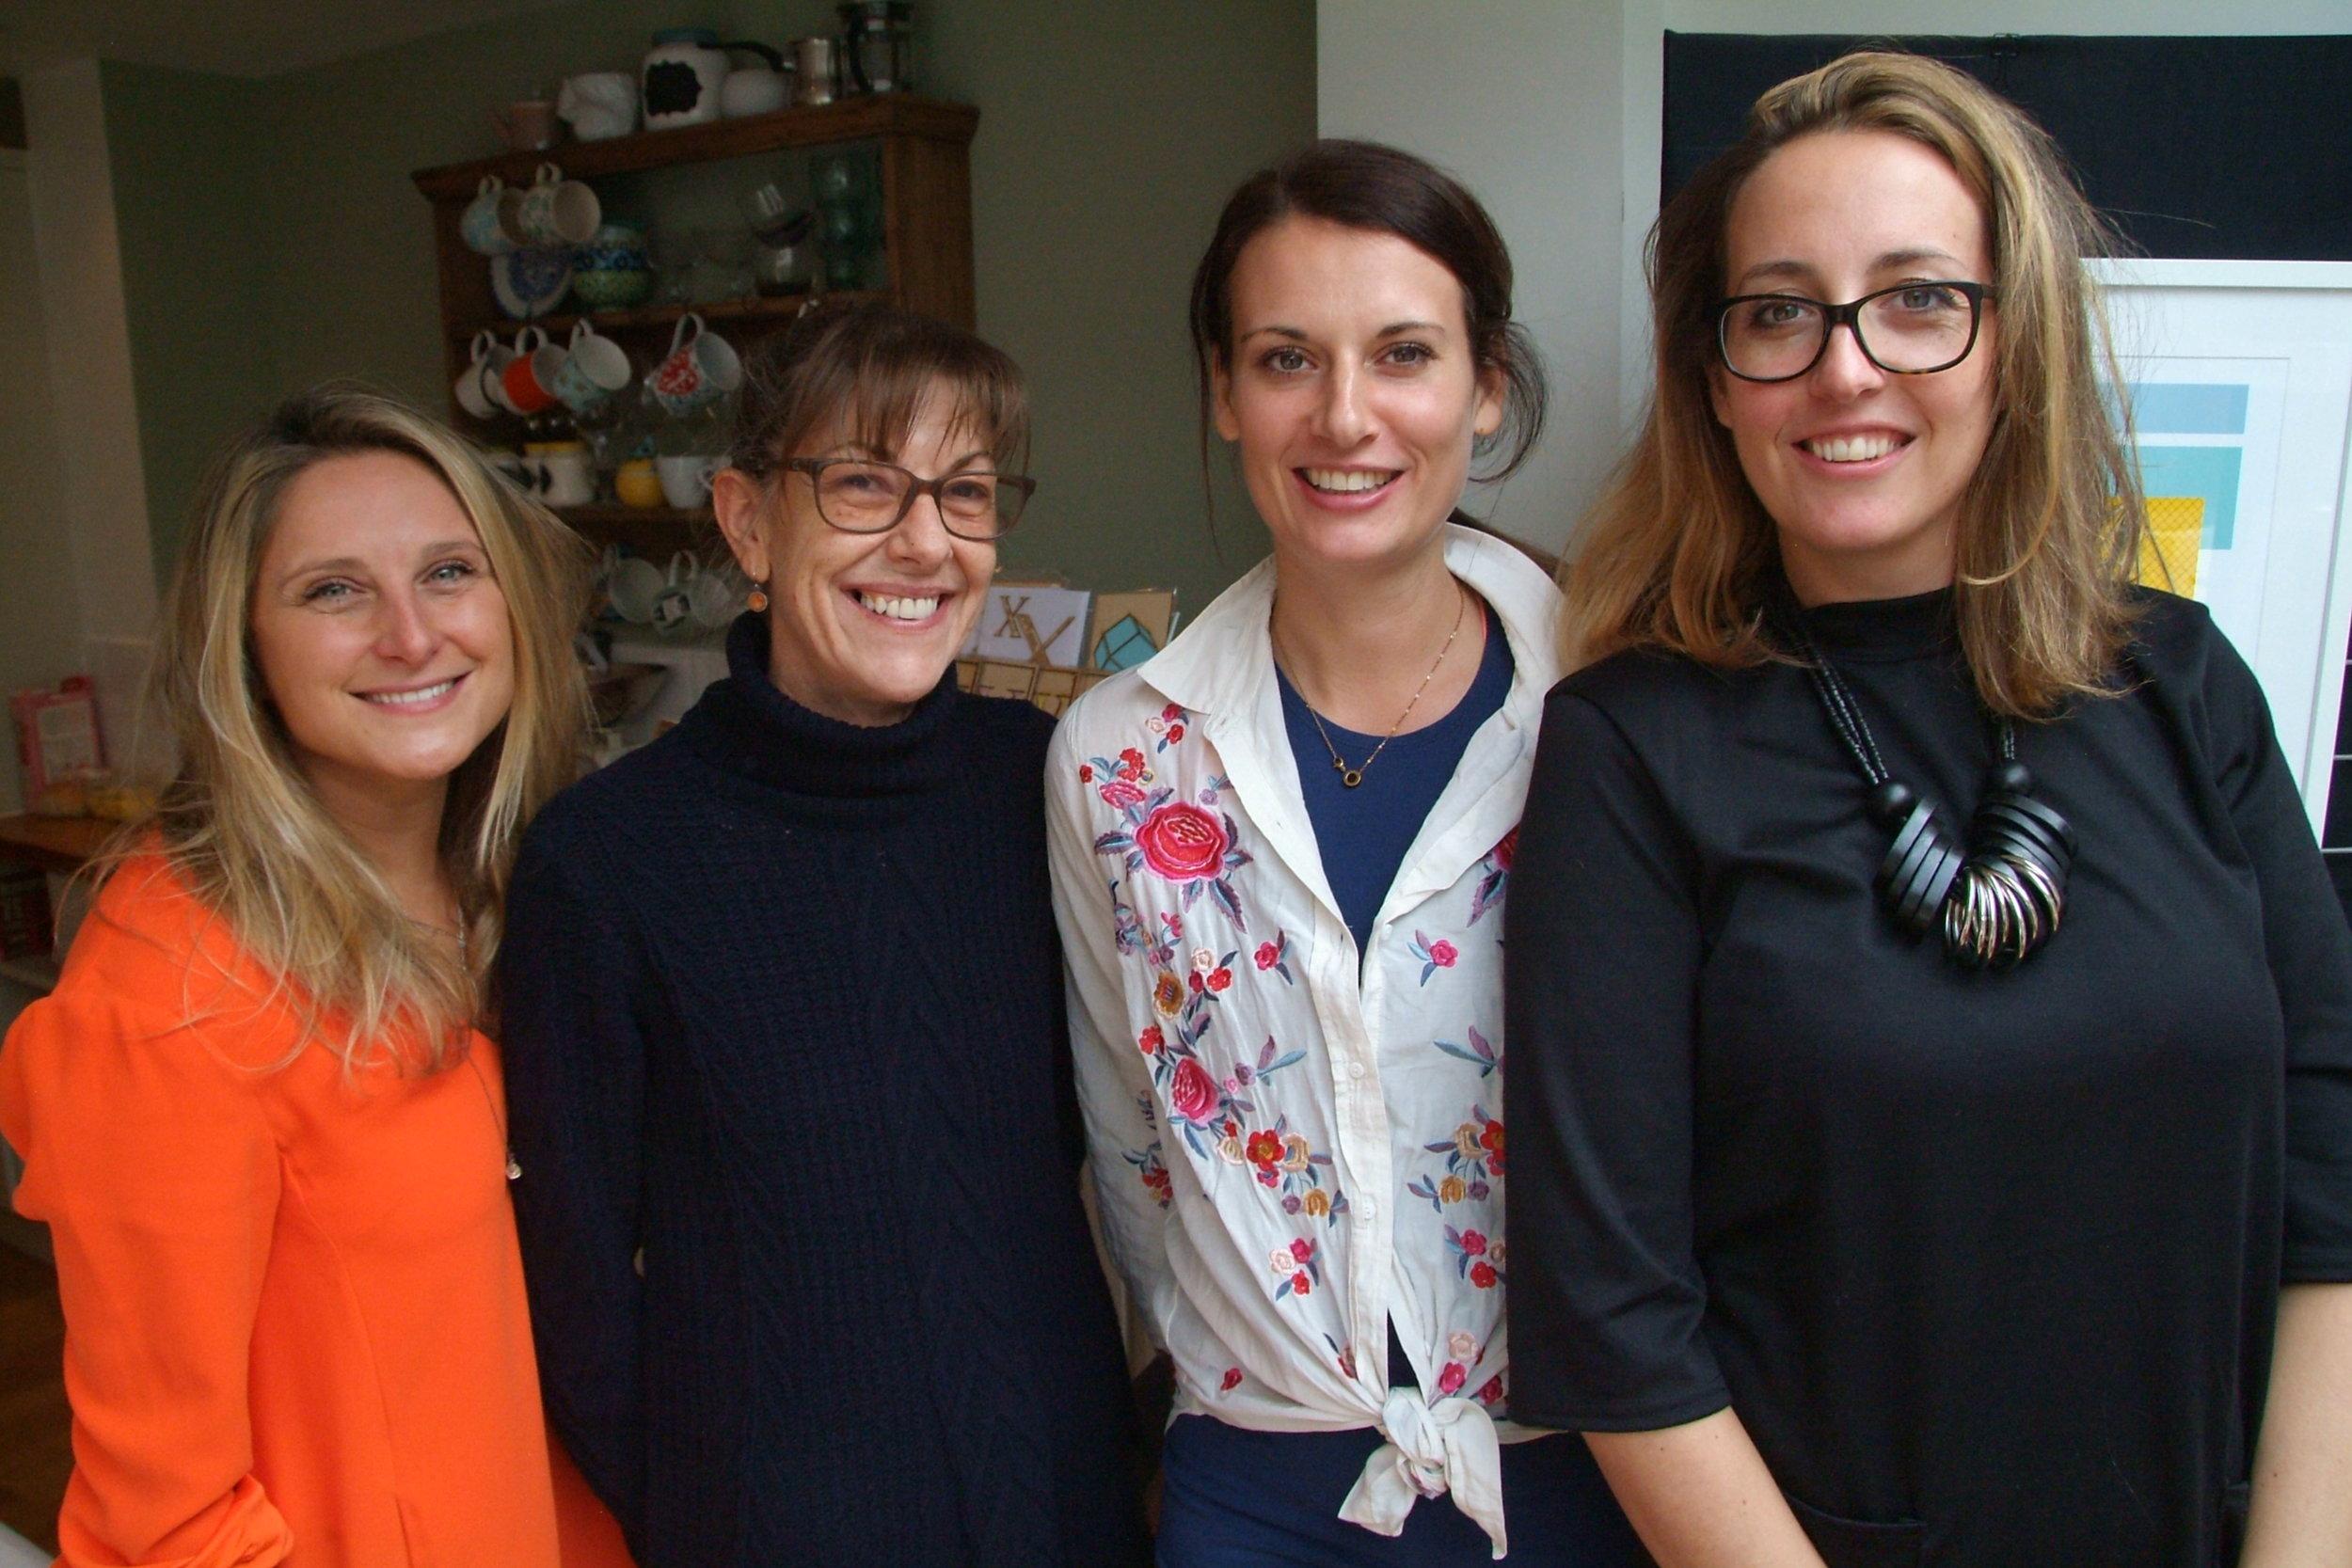 Emma Jayne Emmott (Fine Art Printmaker), Billie Buck (Ceramicist), Michelle Derrick (GingerLine Designs), Emma Goodwin (Studio-M Design)